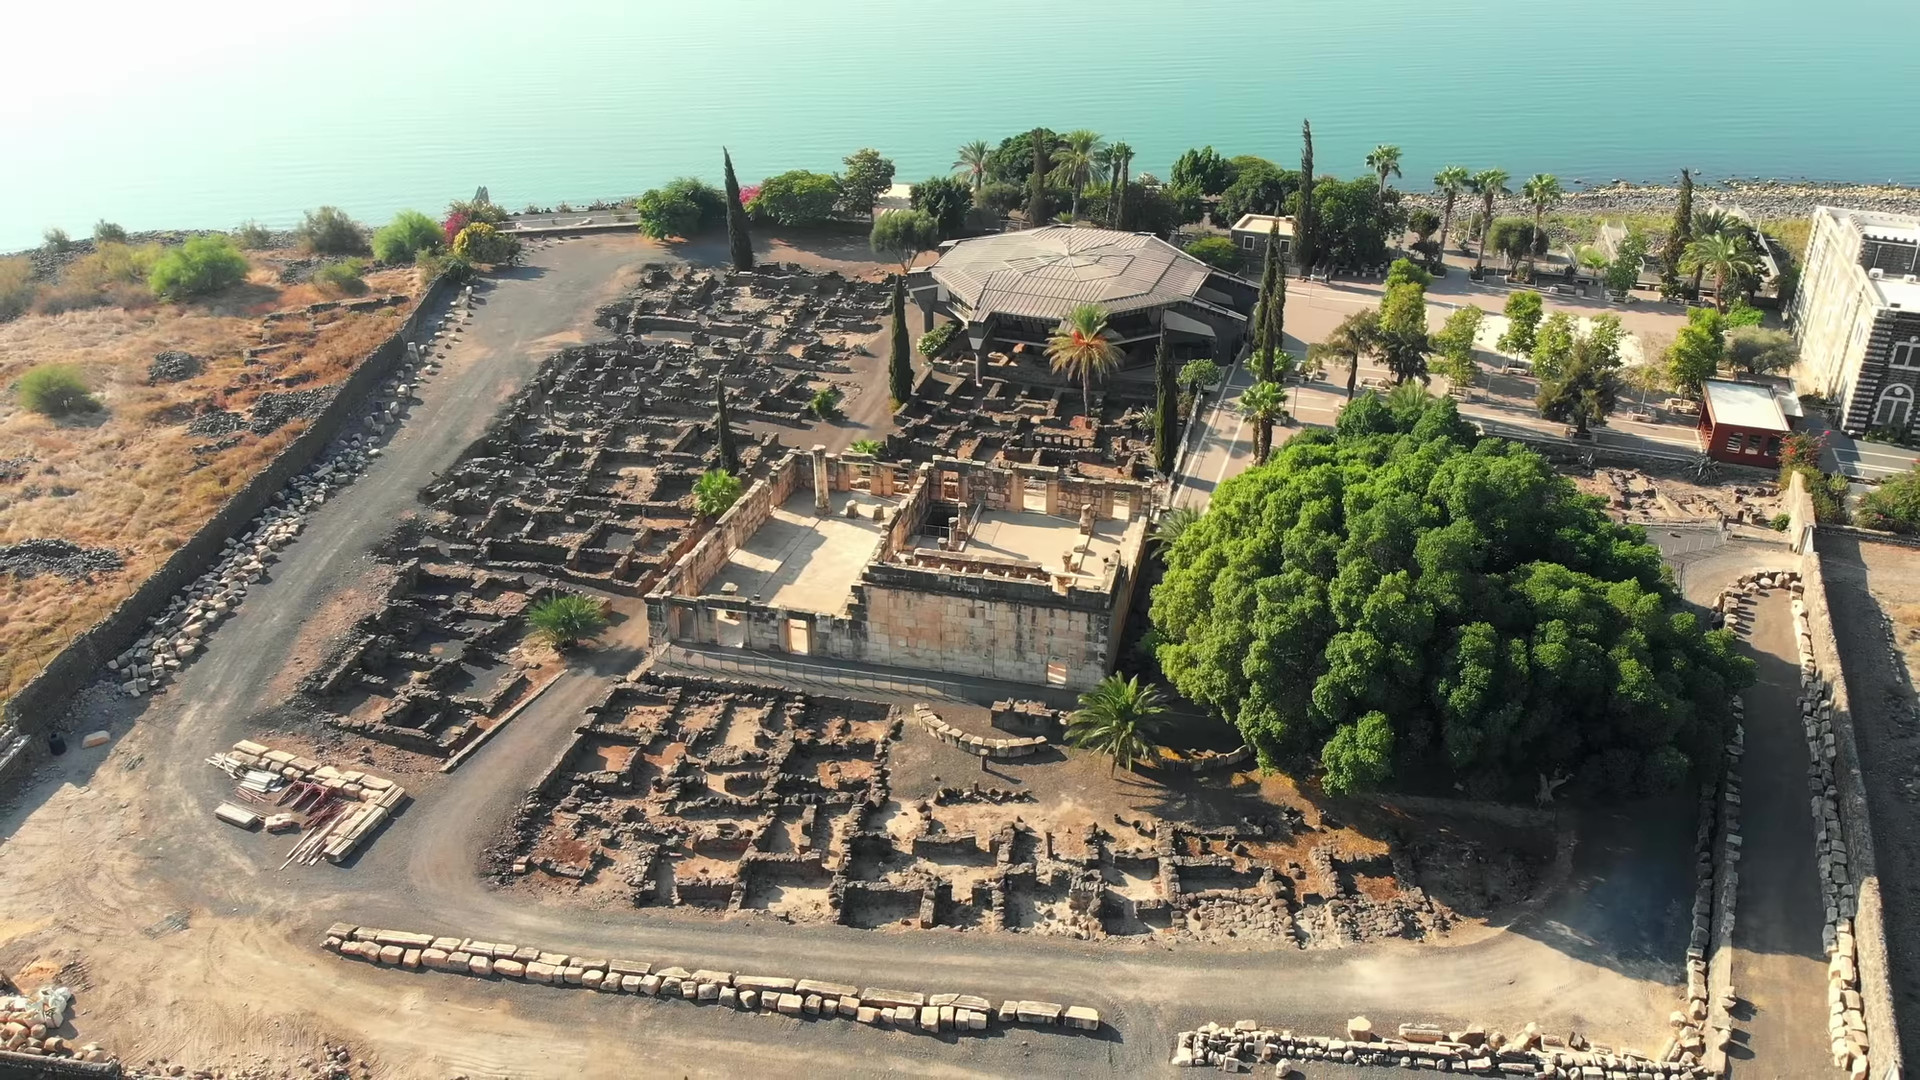 Capernaum, the town of Jesus_Moment6.jpg